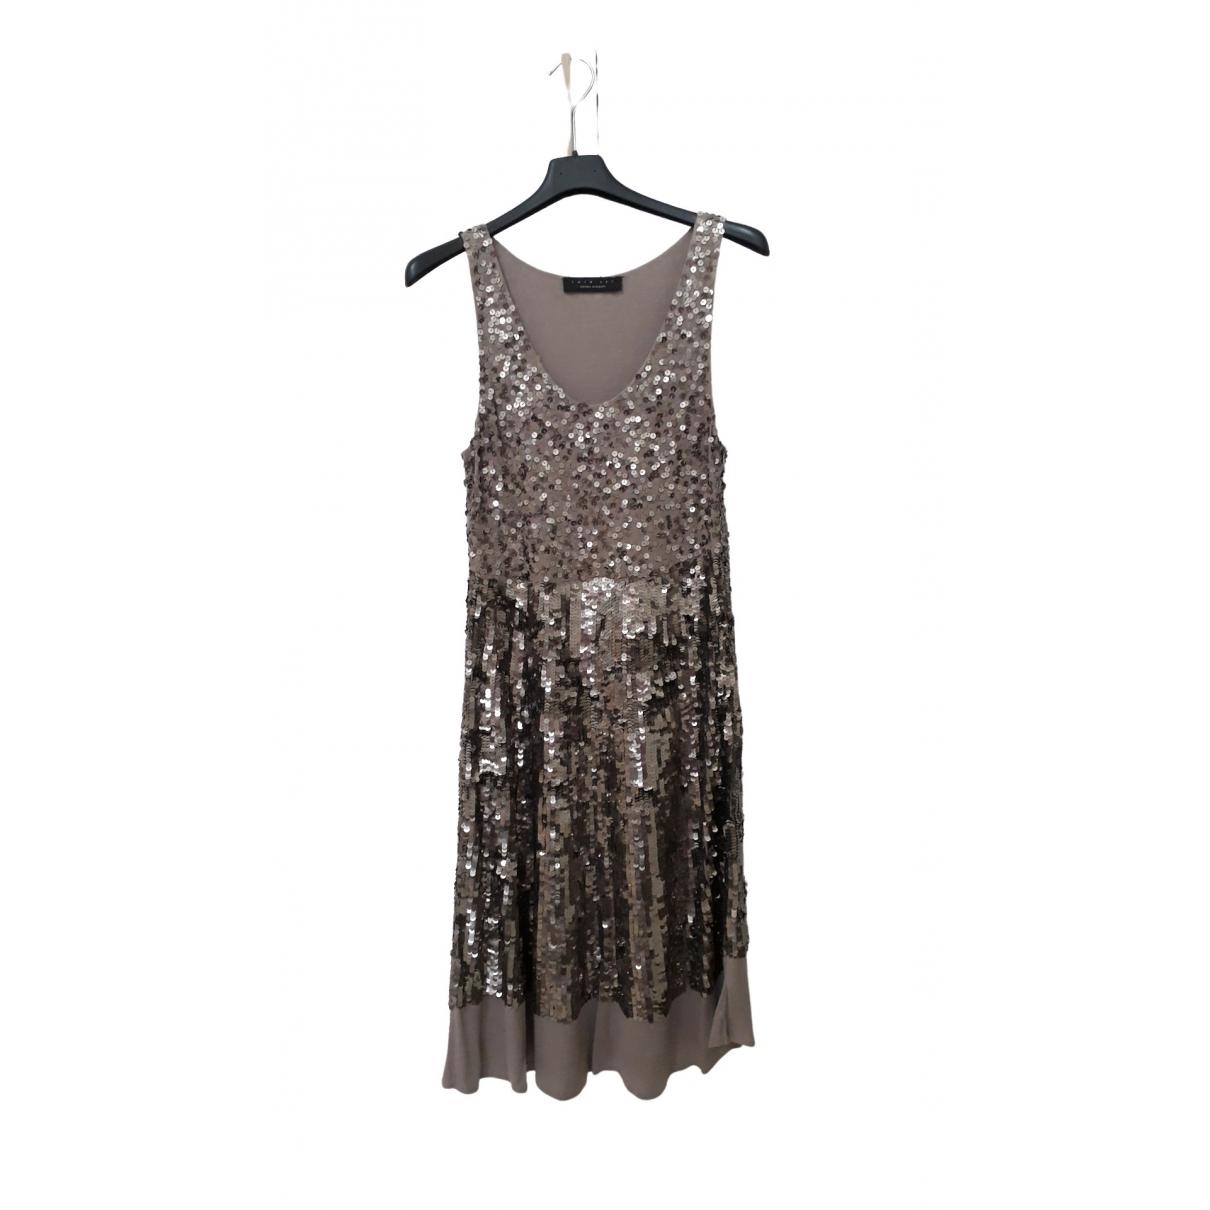 Twin Set \N Kleid in  Metallic Mit Pailletten